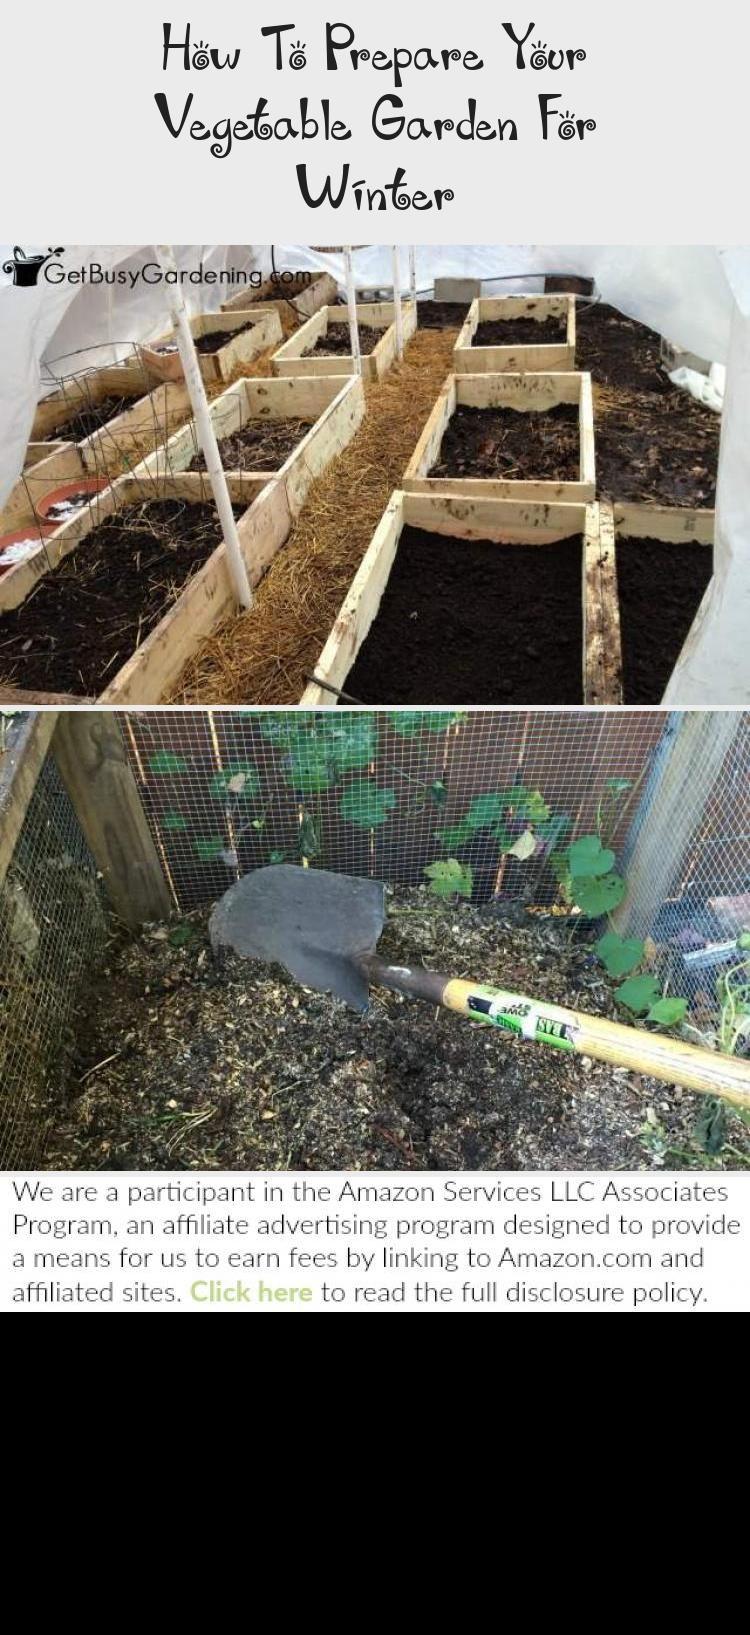 How To Prepare Your Vegetable Garden